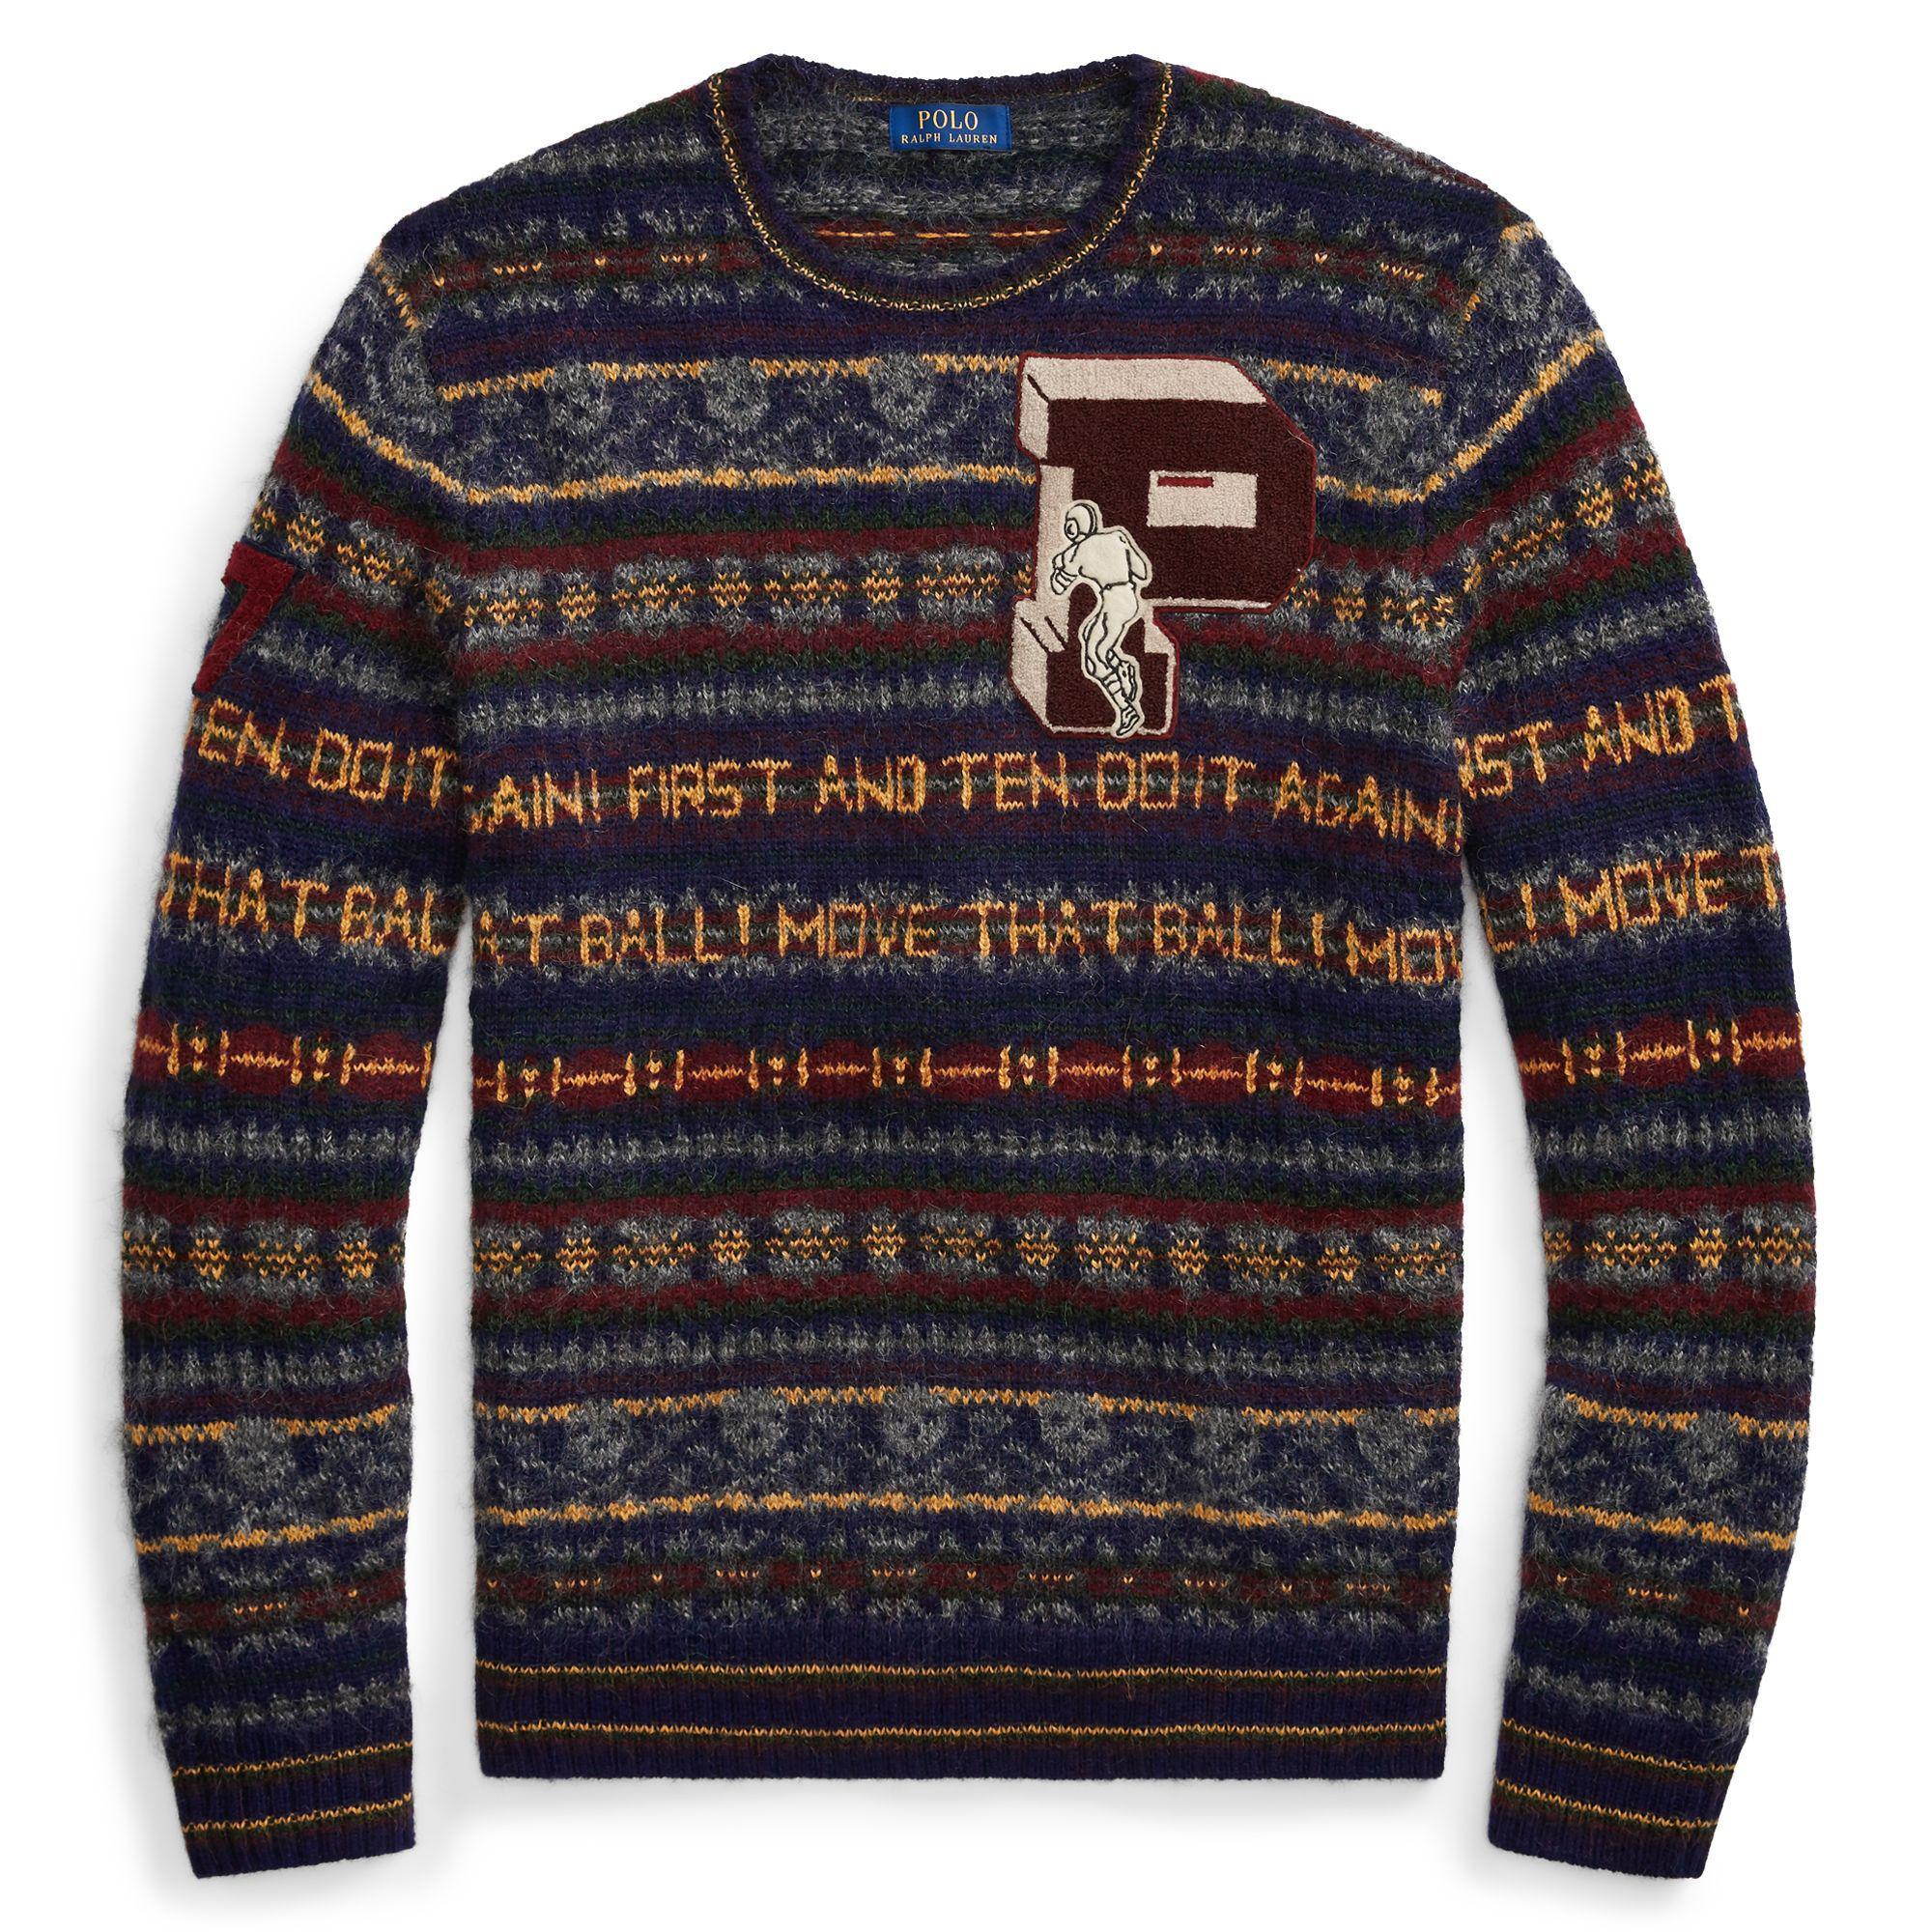 ed49d2f974 Polo Ralph Lauren Fair Isle Wool-blend Sweater in Blue for Men - Lyst